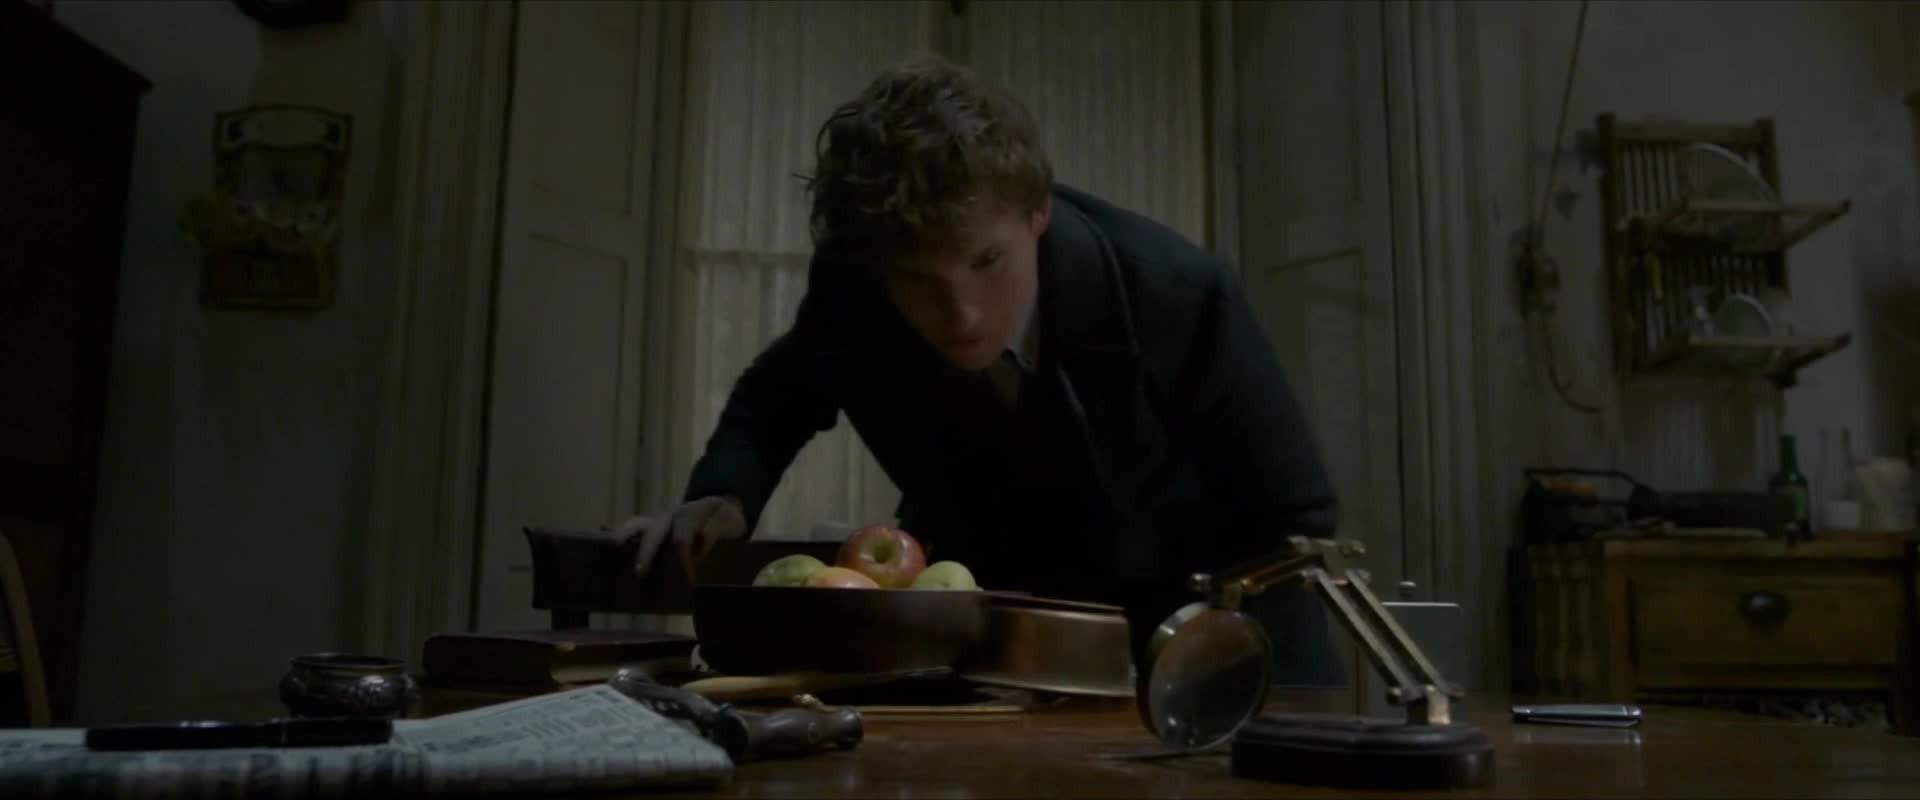 Fantastic.Beasts.The.Crimes.of.Grindelwald.2018.1080p.HC.HDRip تحميل تورنت فيلم 2 arabp2p.com